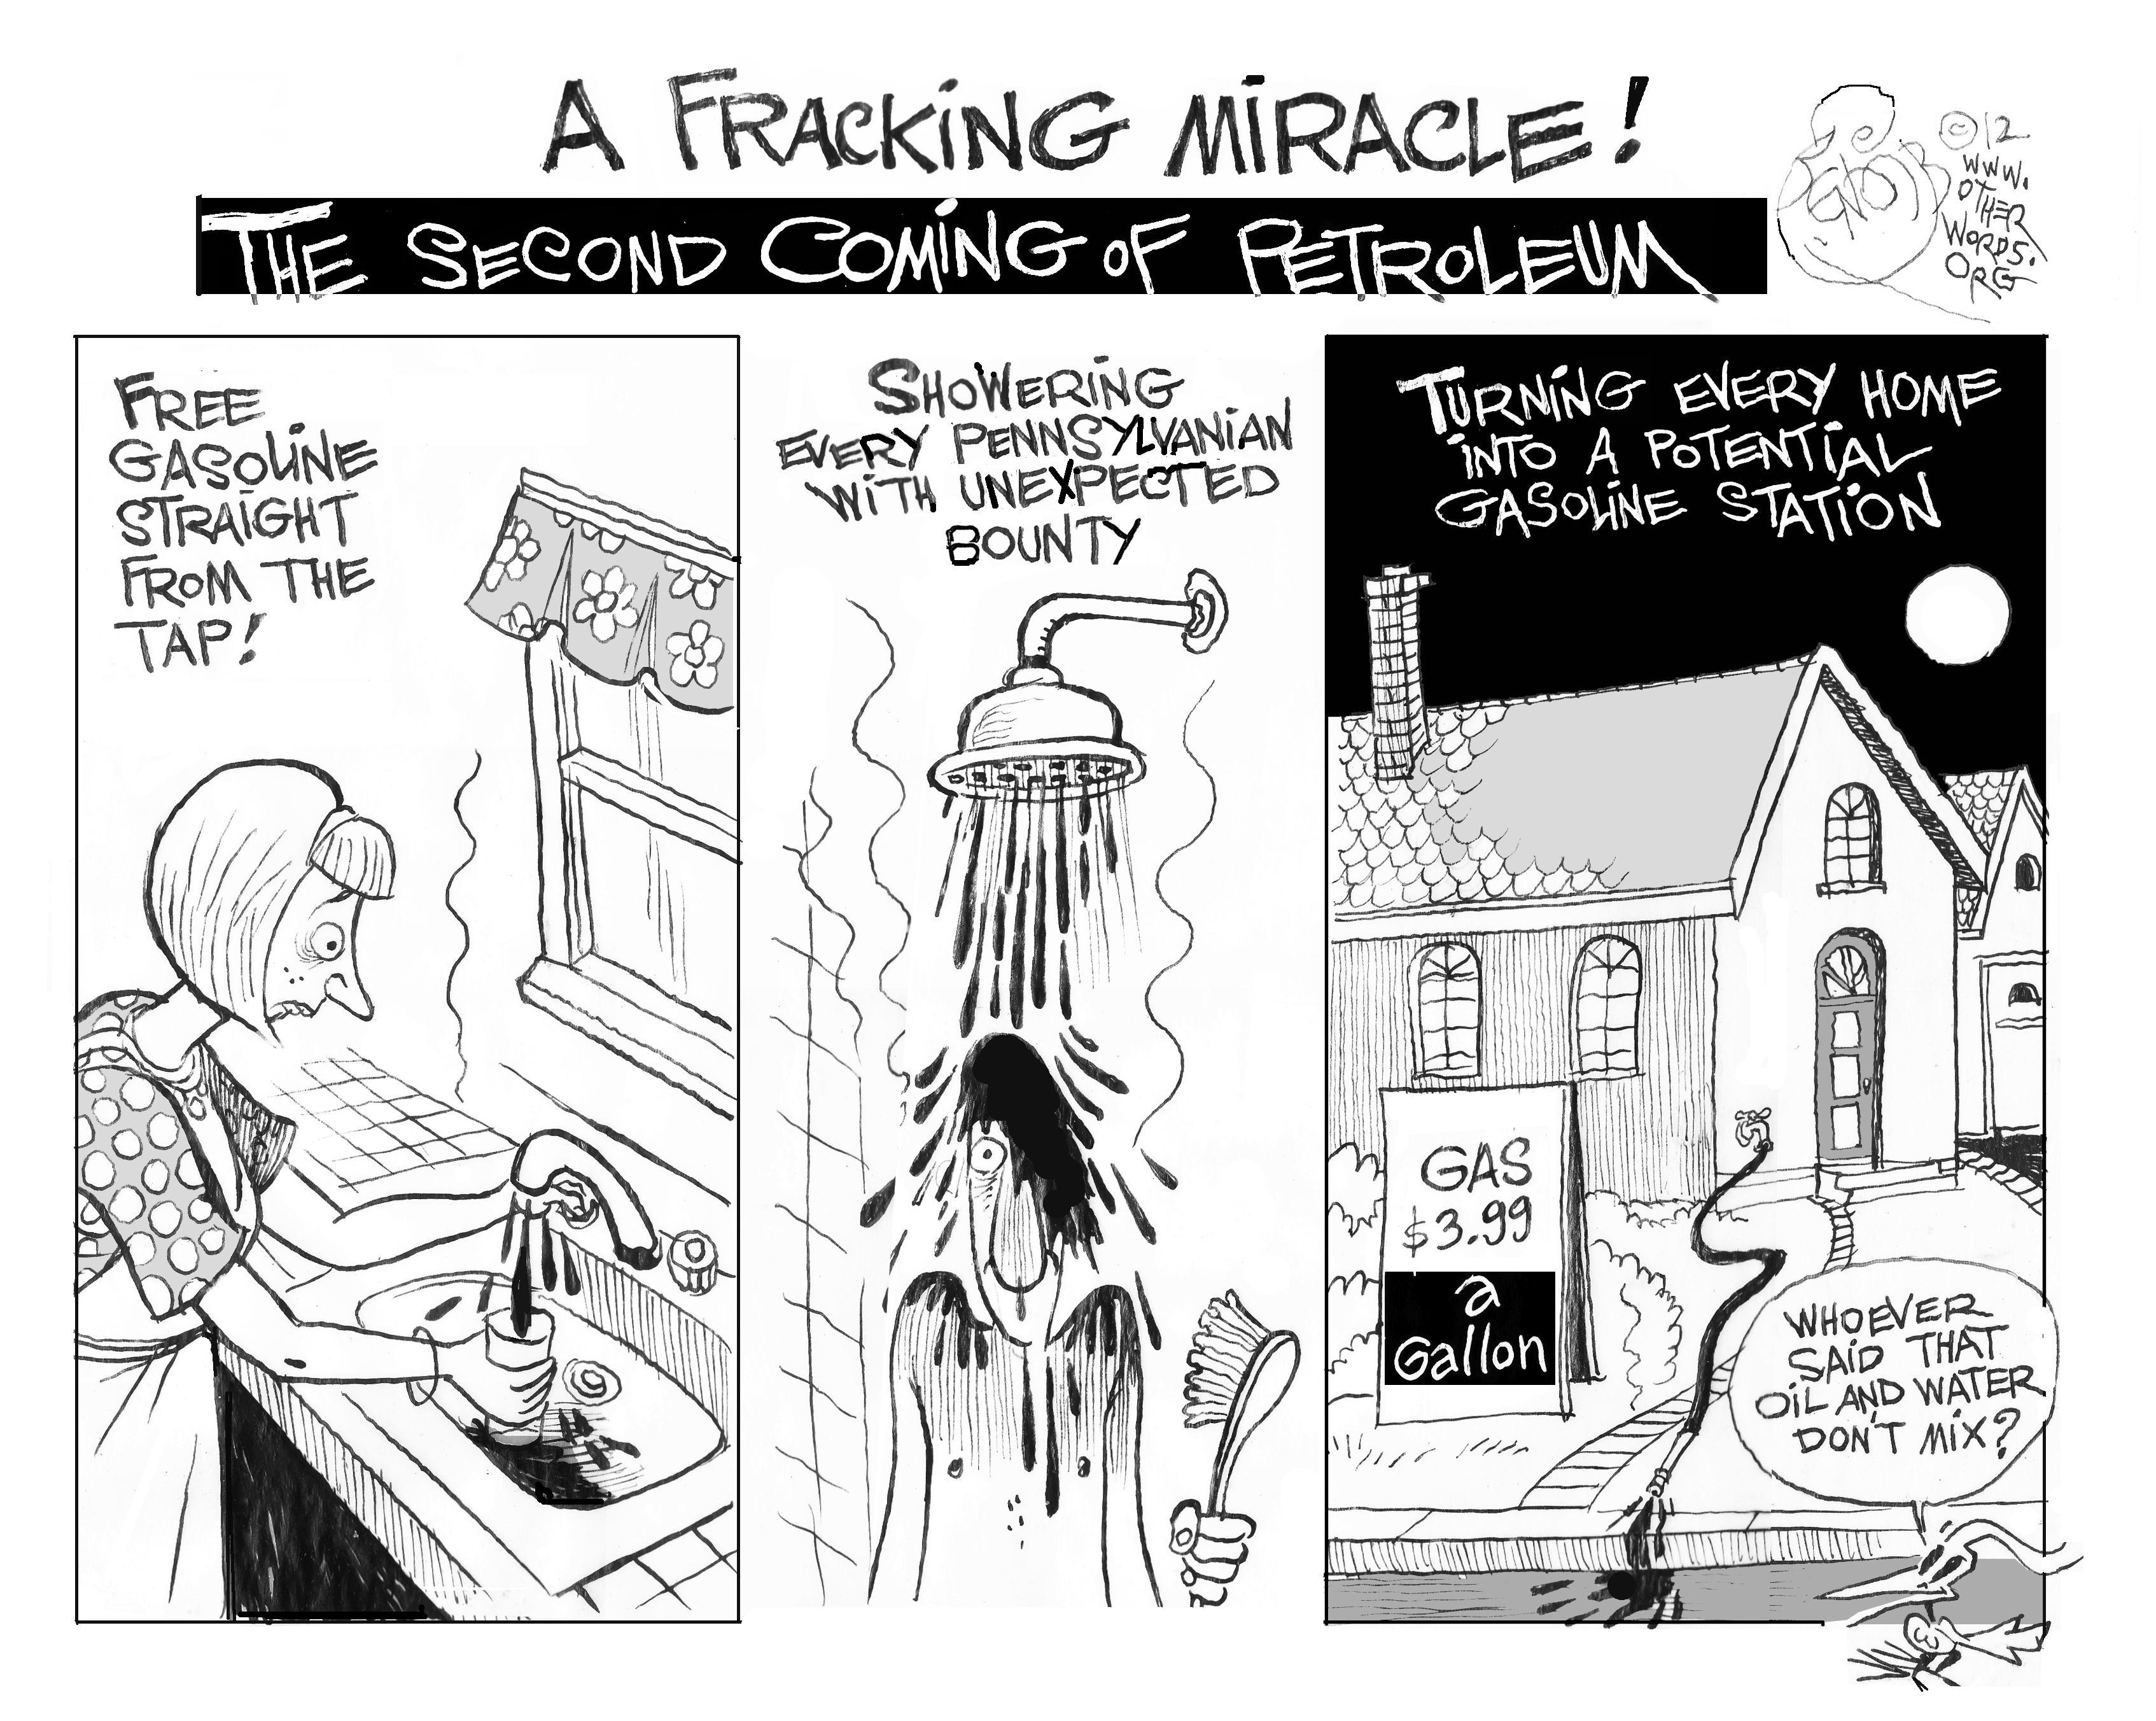 Ohio Earthquakes Underscore Fracking Dangers